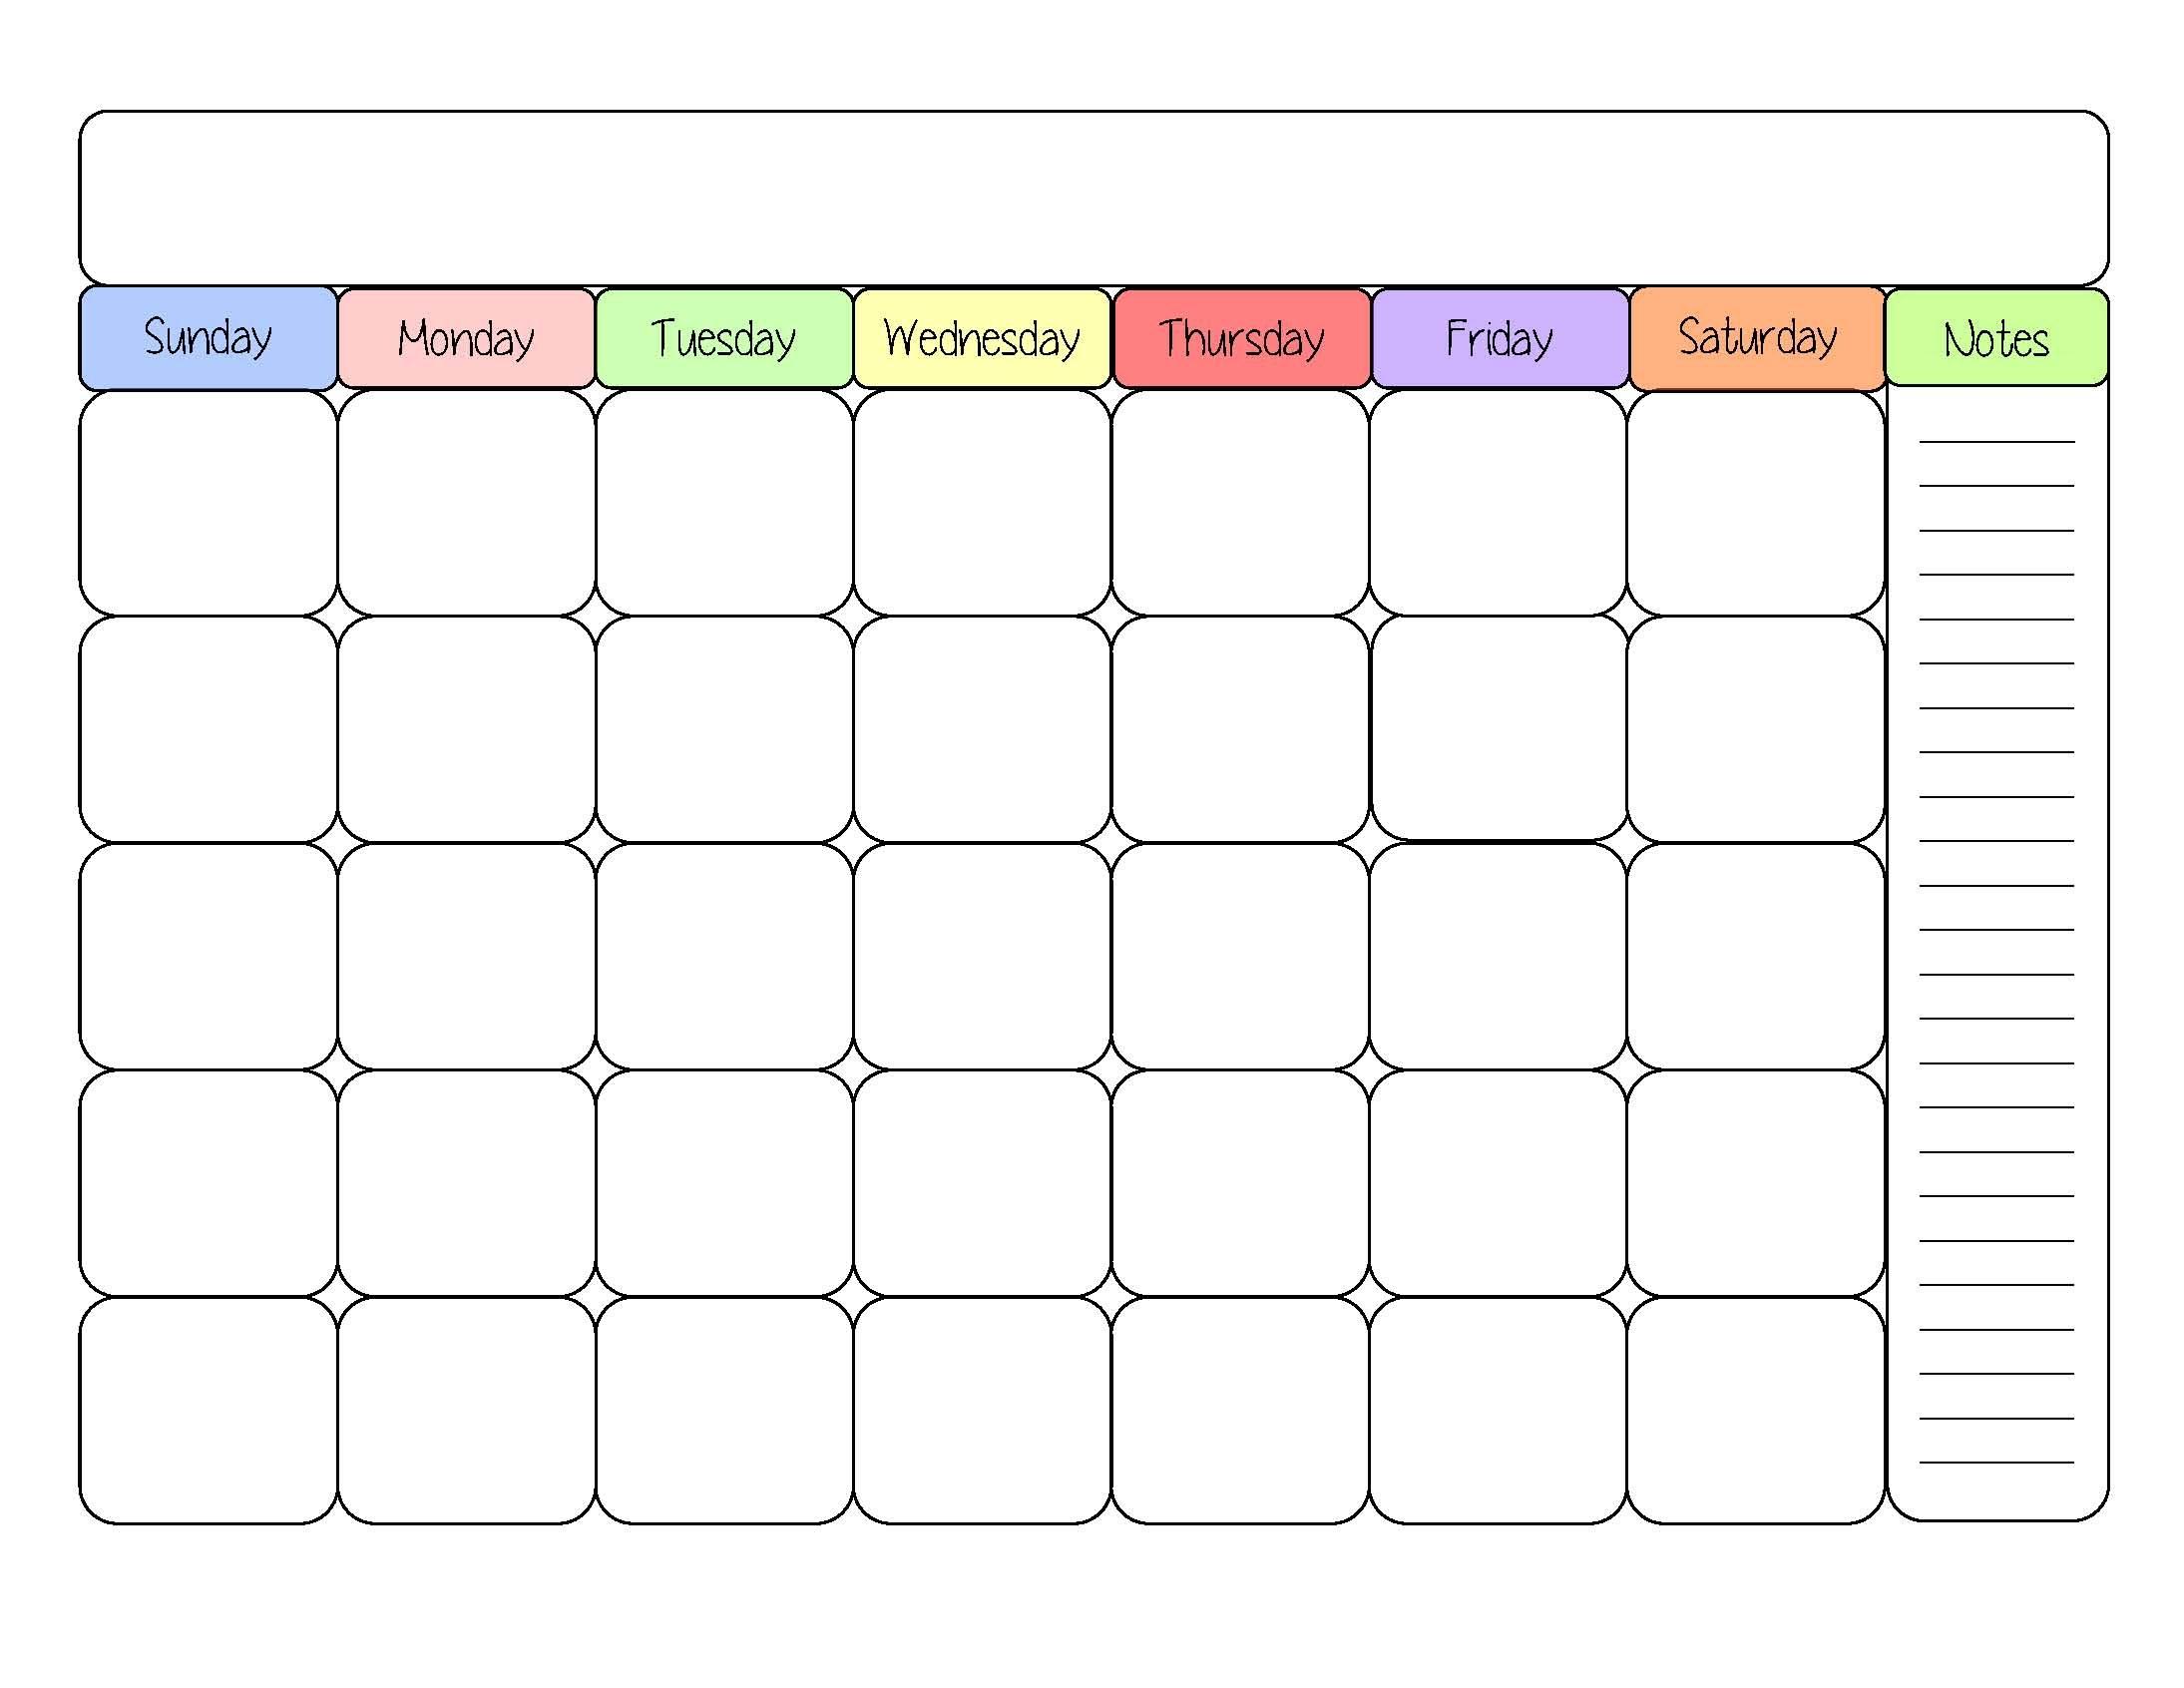 Free Editable Printable Calendars Printable Calendar Templates 20183abry